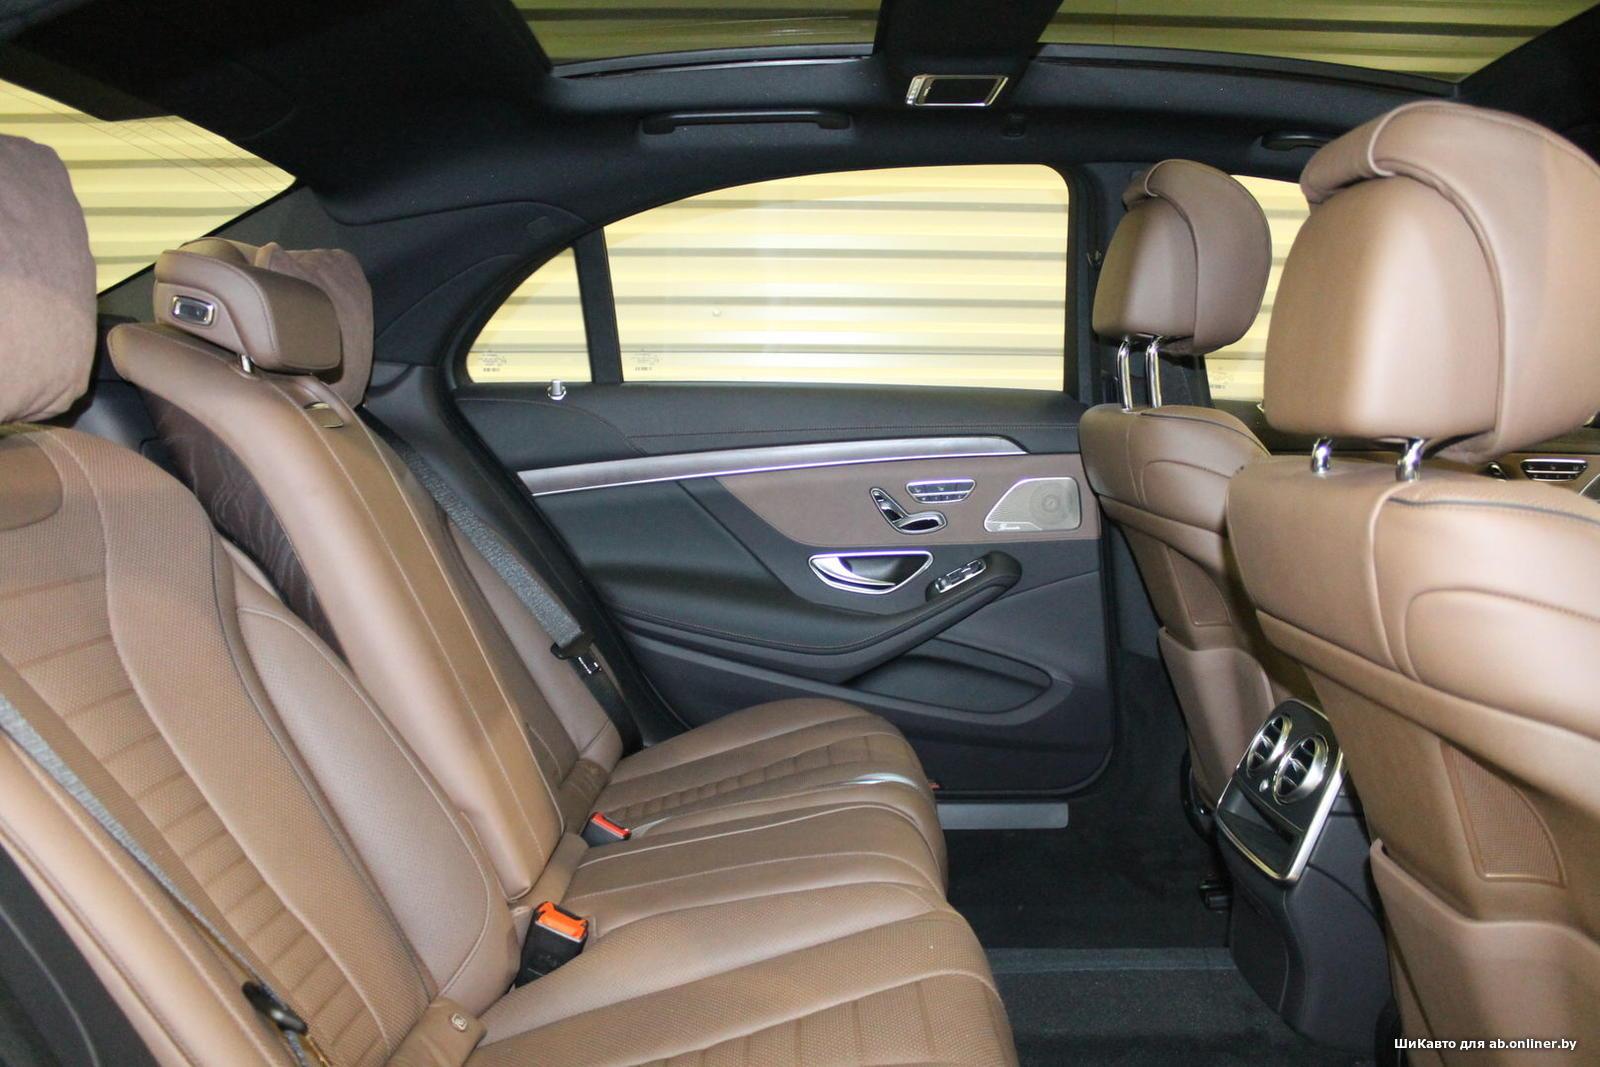 Mercedes S450 4MATIC